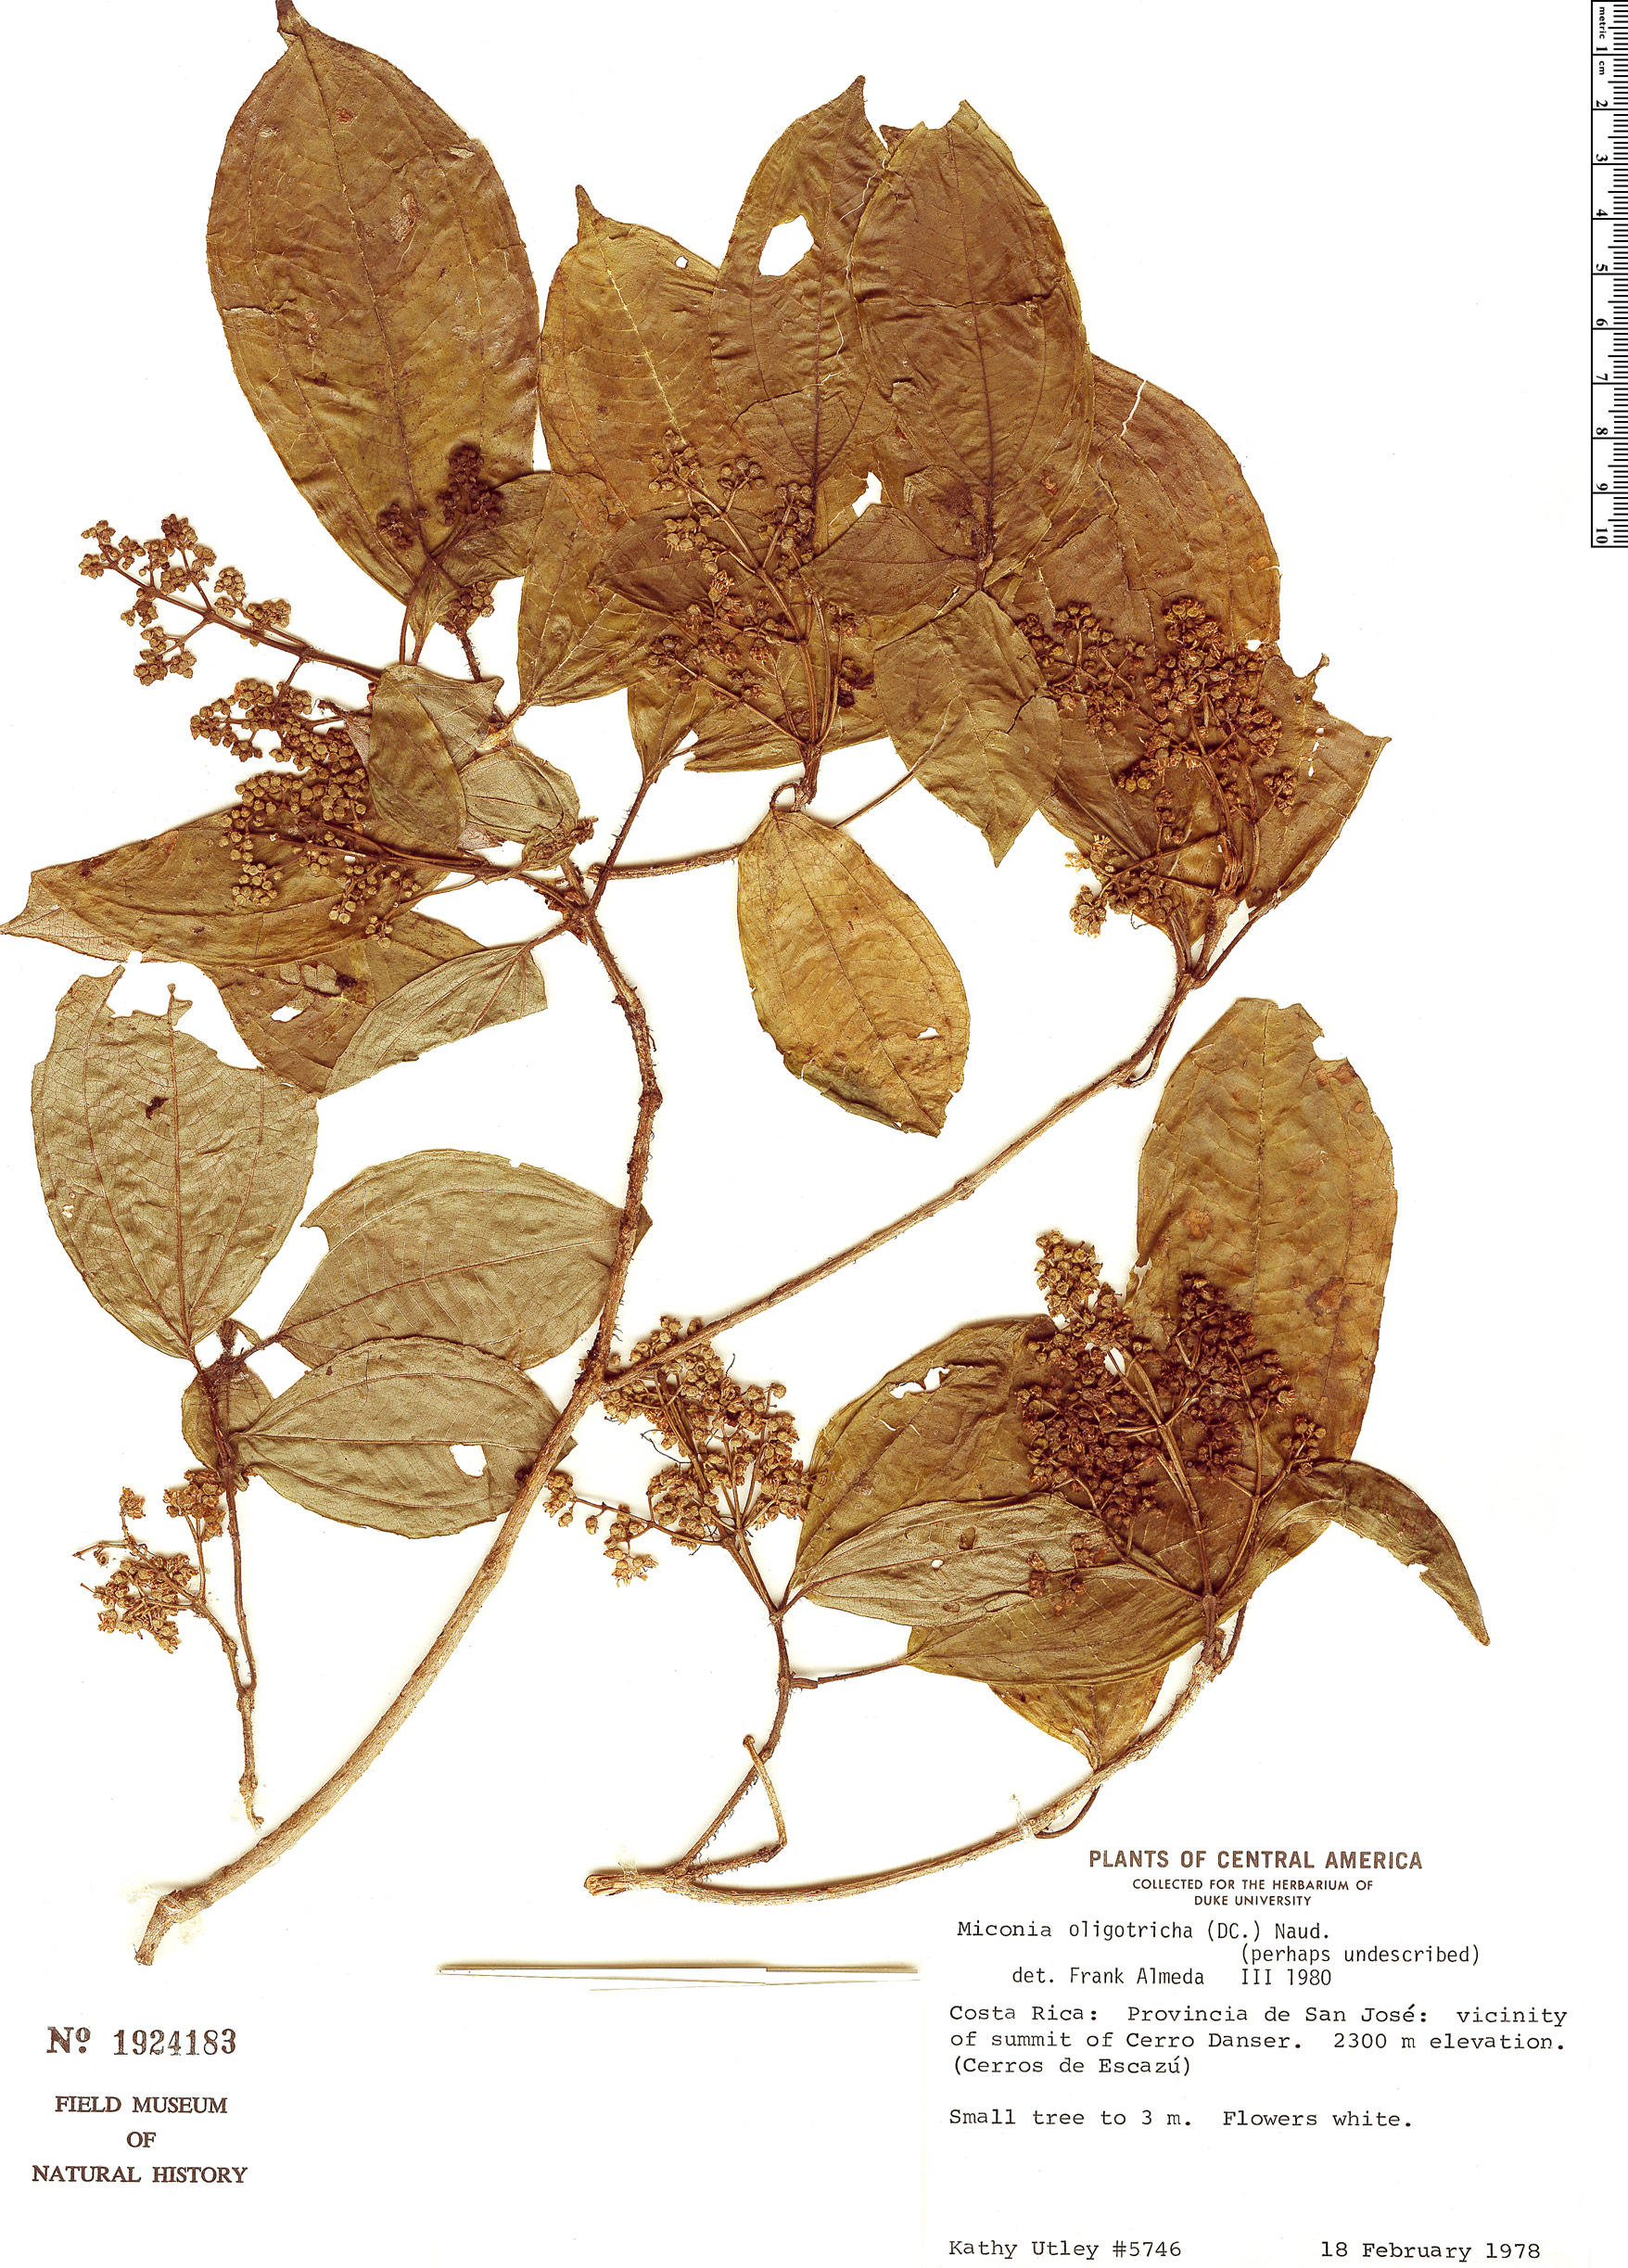 Espécimen: Miconia oligotricha